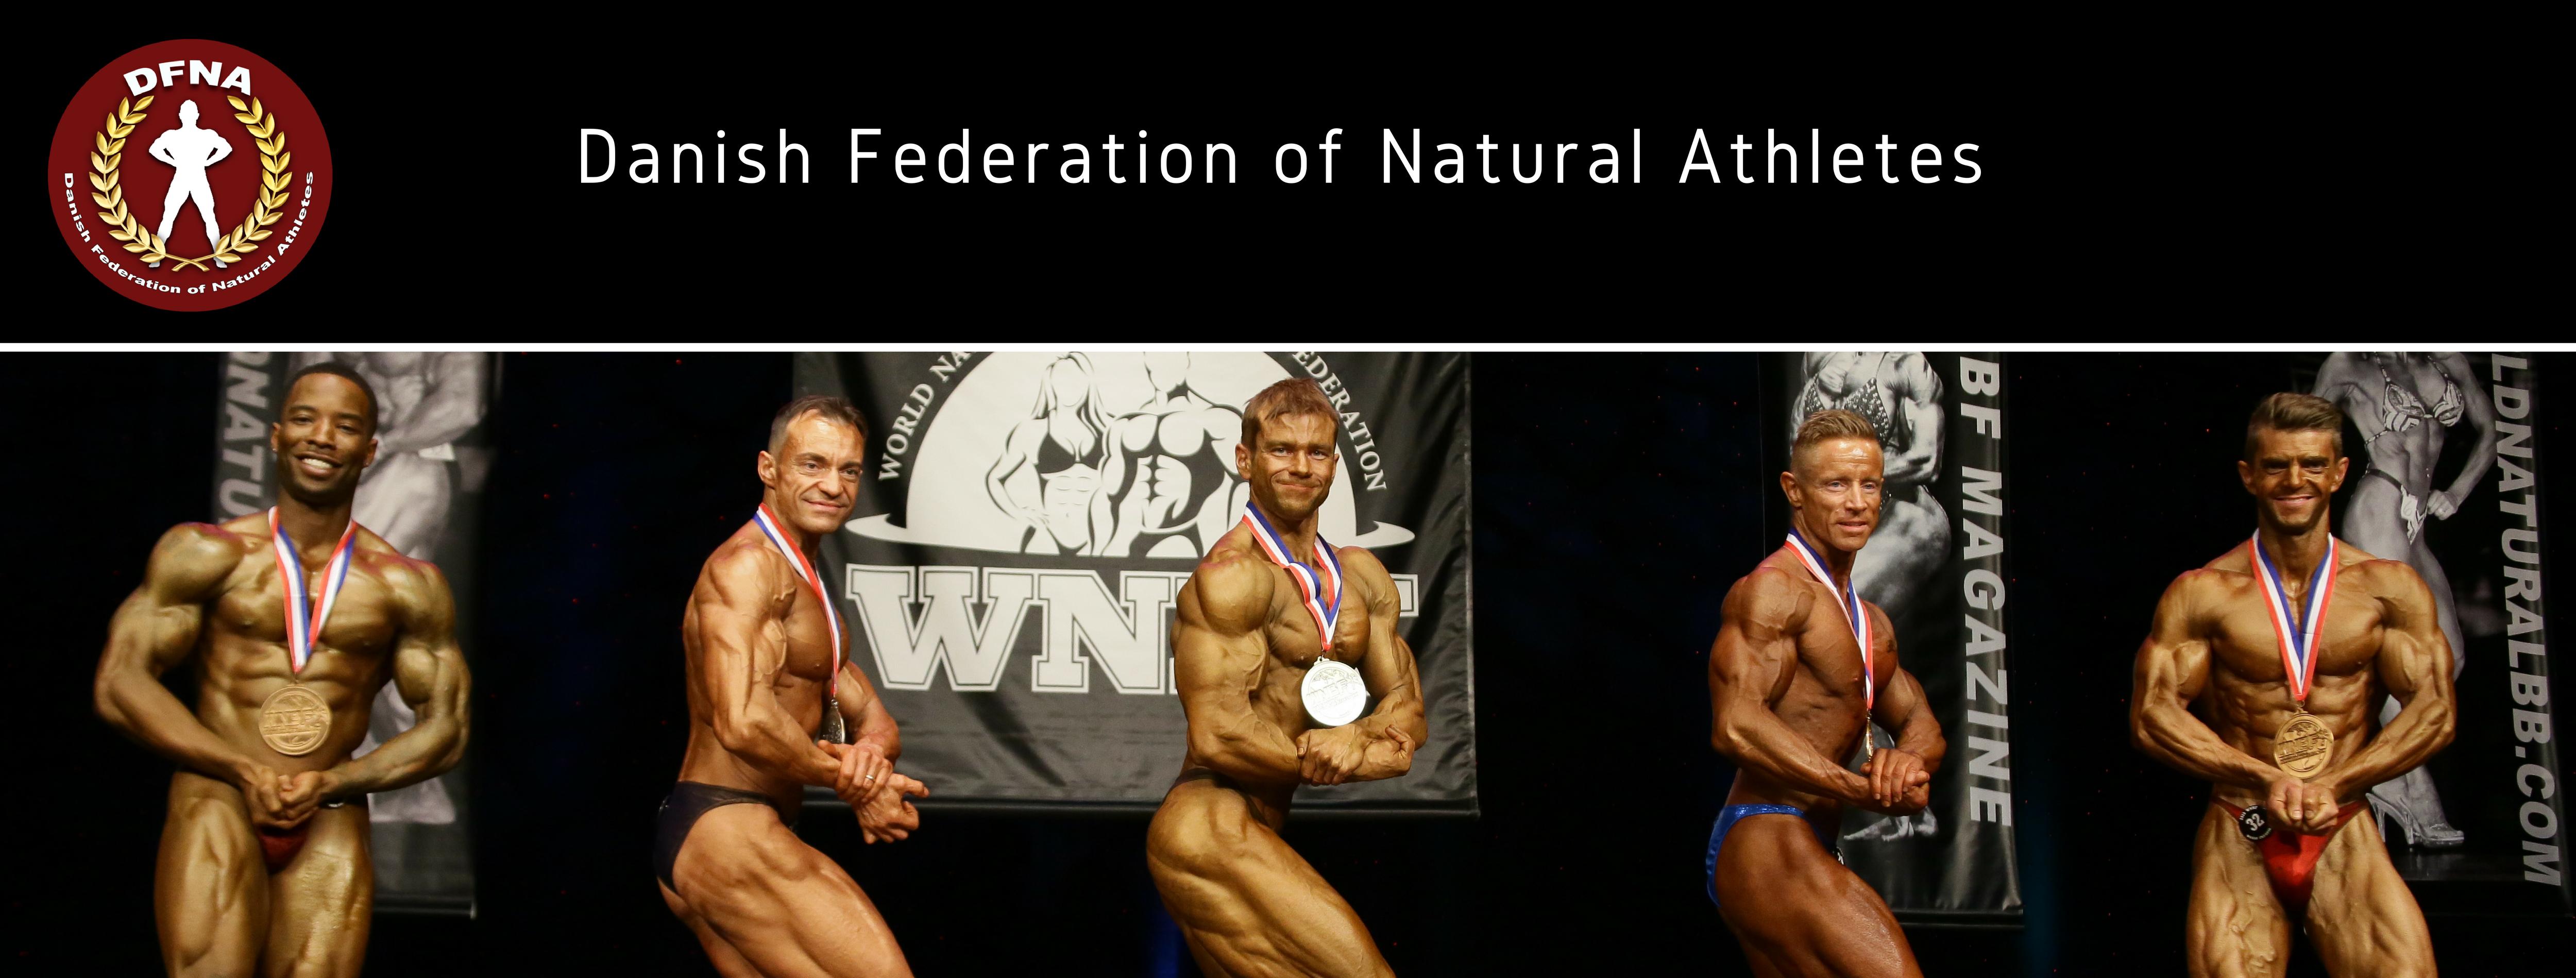 Danish Federation of Natural Athletes